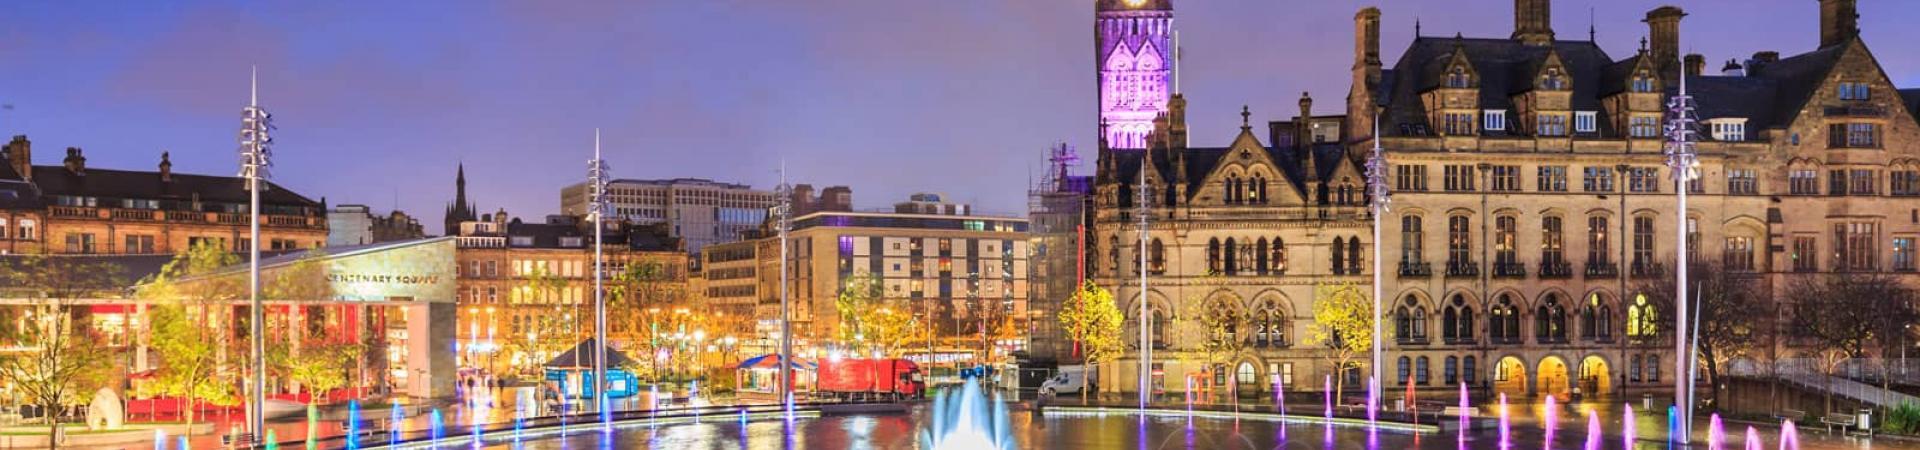 Main banner image of Bradford city centre